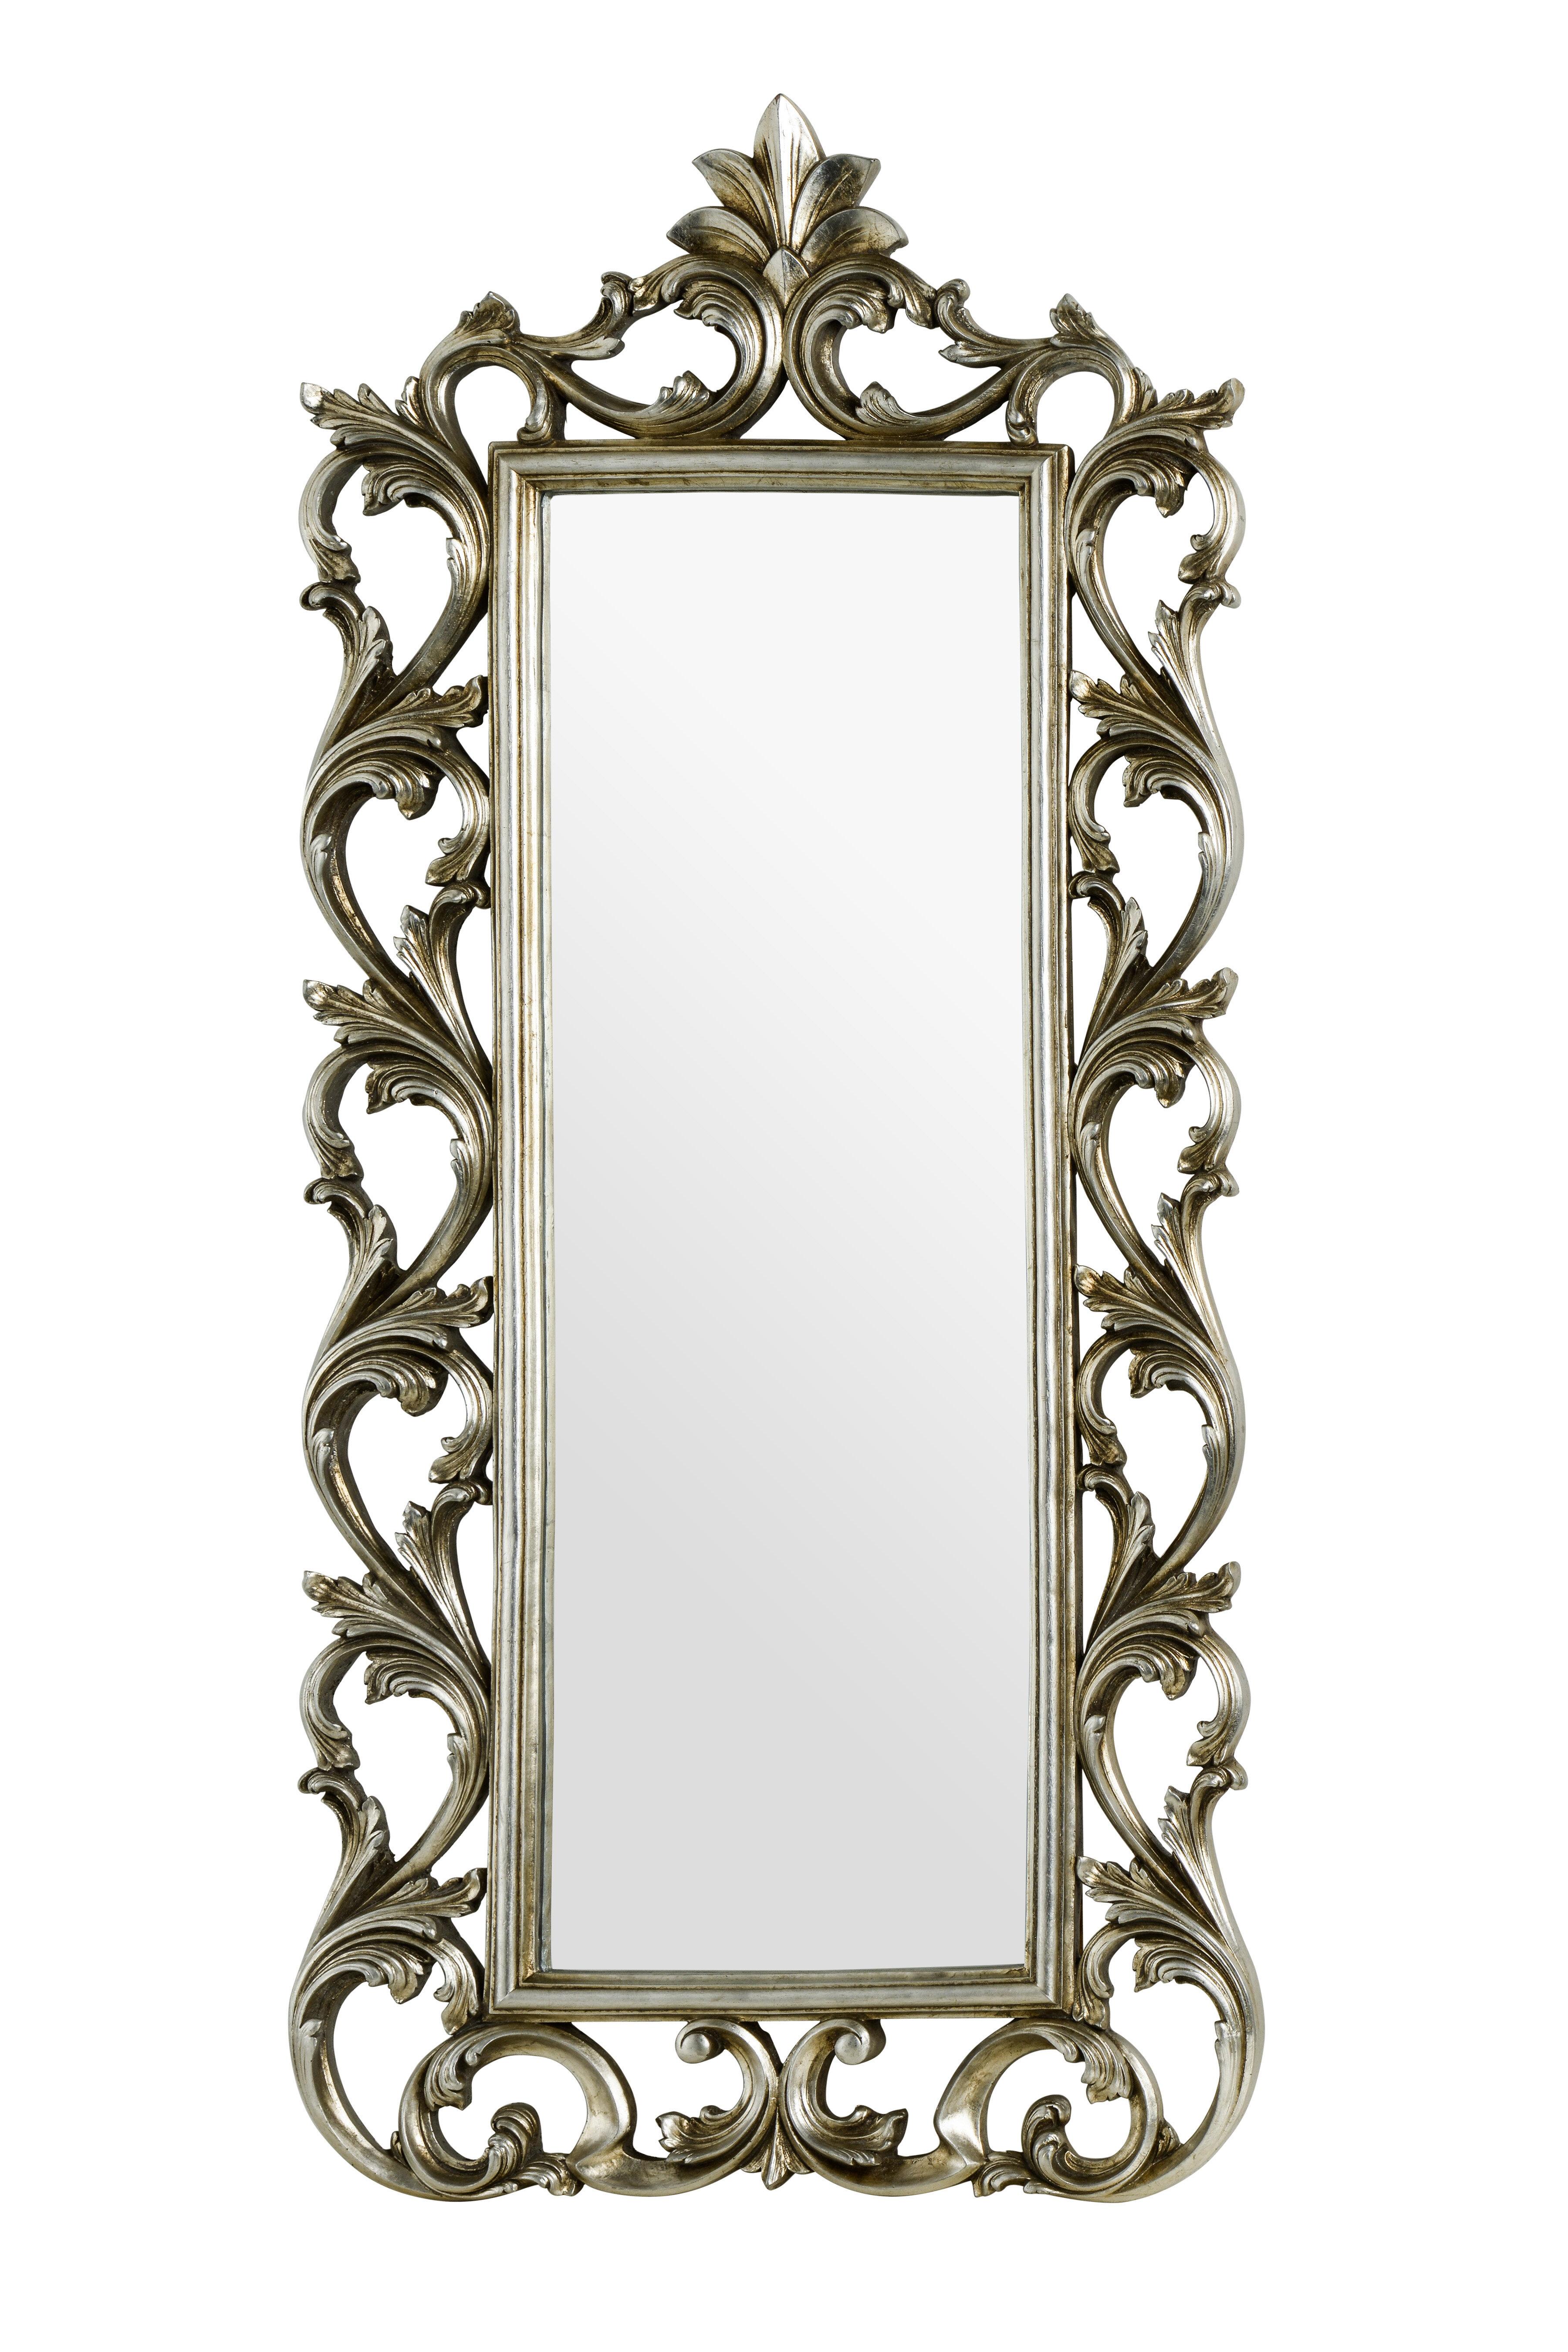 Symple Stuff Ornate Wall Mirror Wayfair Co Uk